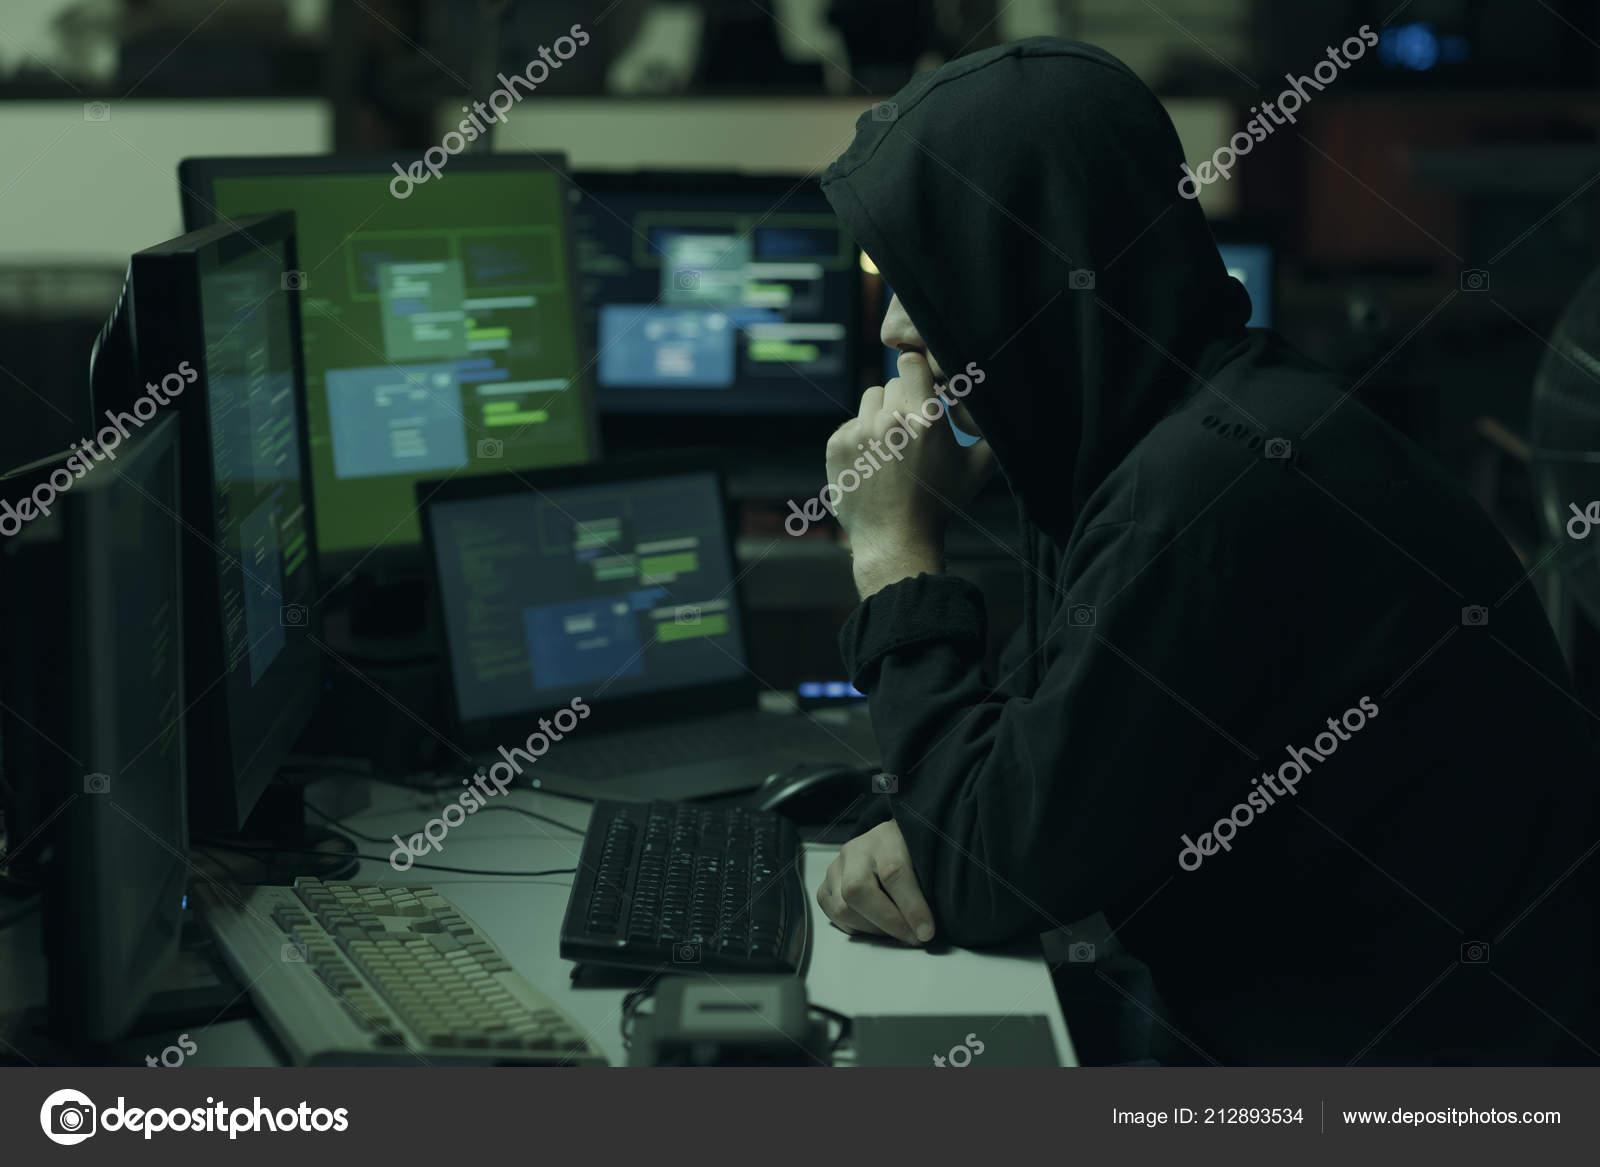 f0c1677e06 Νεαρή Χάκερ Ένα Τρόπο Σκέψης Hoodie Χέρι Στο Πηγούνι Και — Φωτογραφία  Αρχείου